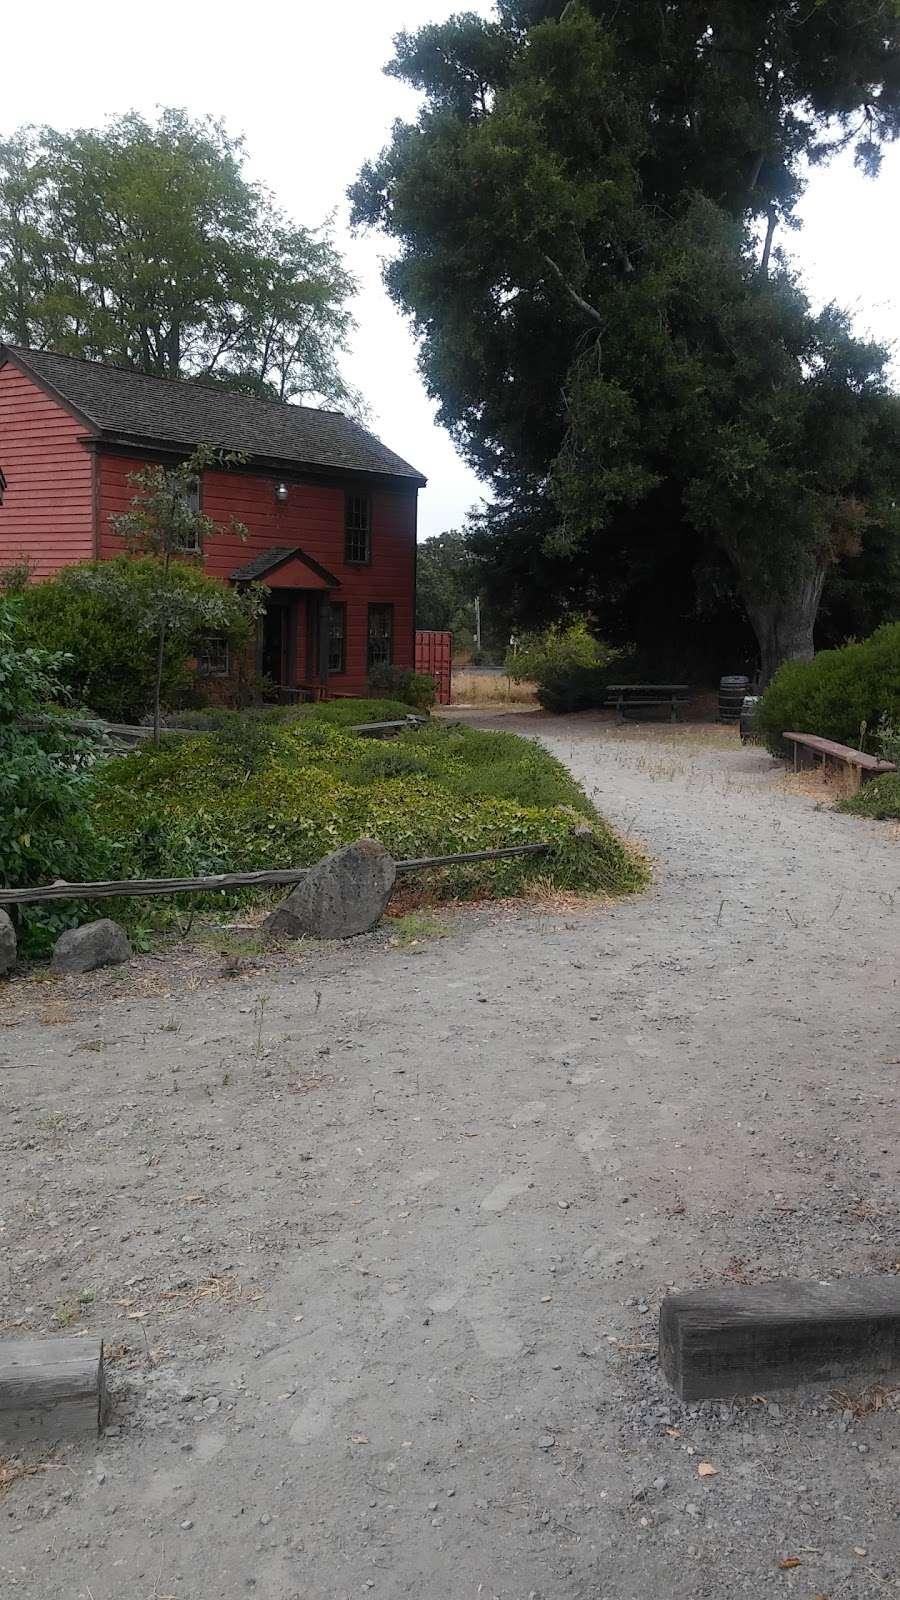 Llano House Antiques - home goods store  | Photo 4 of 4 | Address: 4353 Gravenstein Hwy S, Sebastopol, CA 95472, USA | Phone: (707) 829-9322